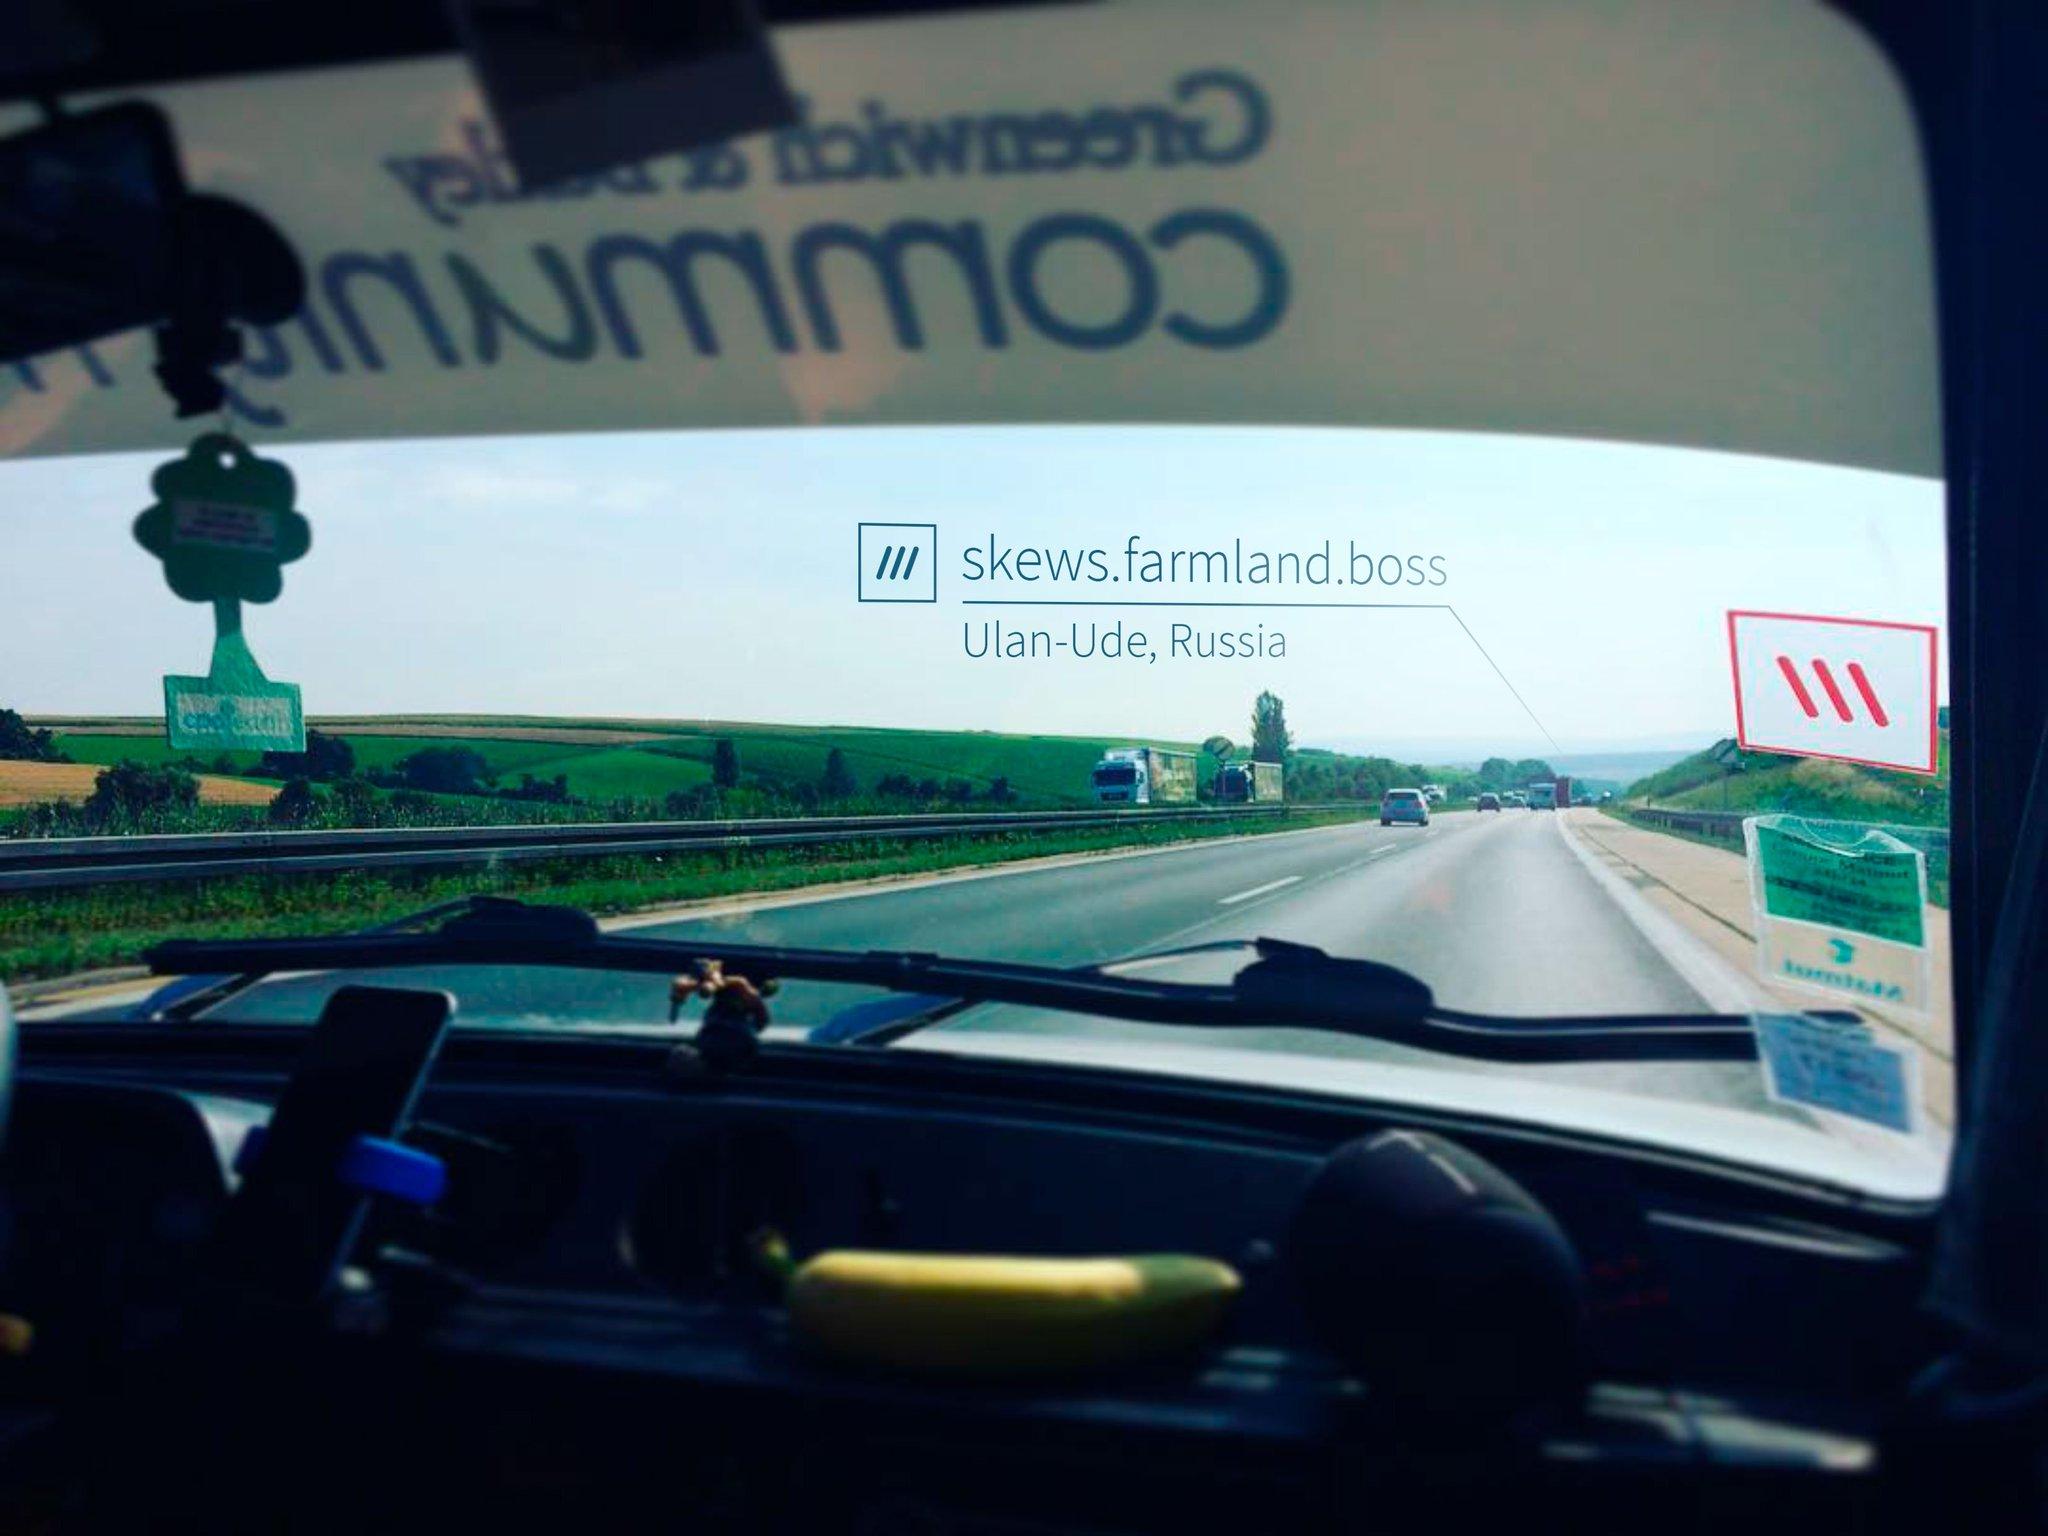 car driving along a road heading towards 3 word address skews.farmland.boss